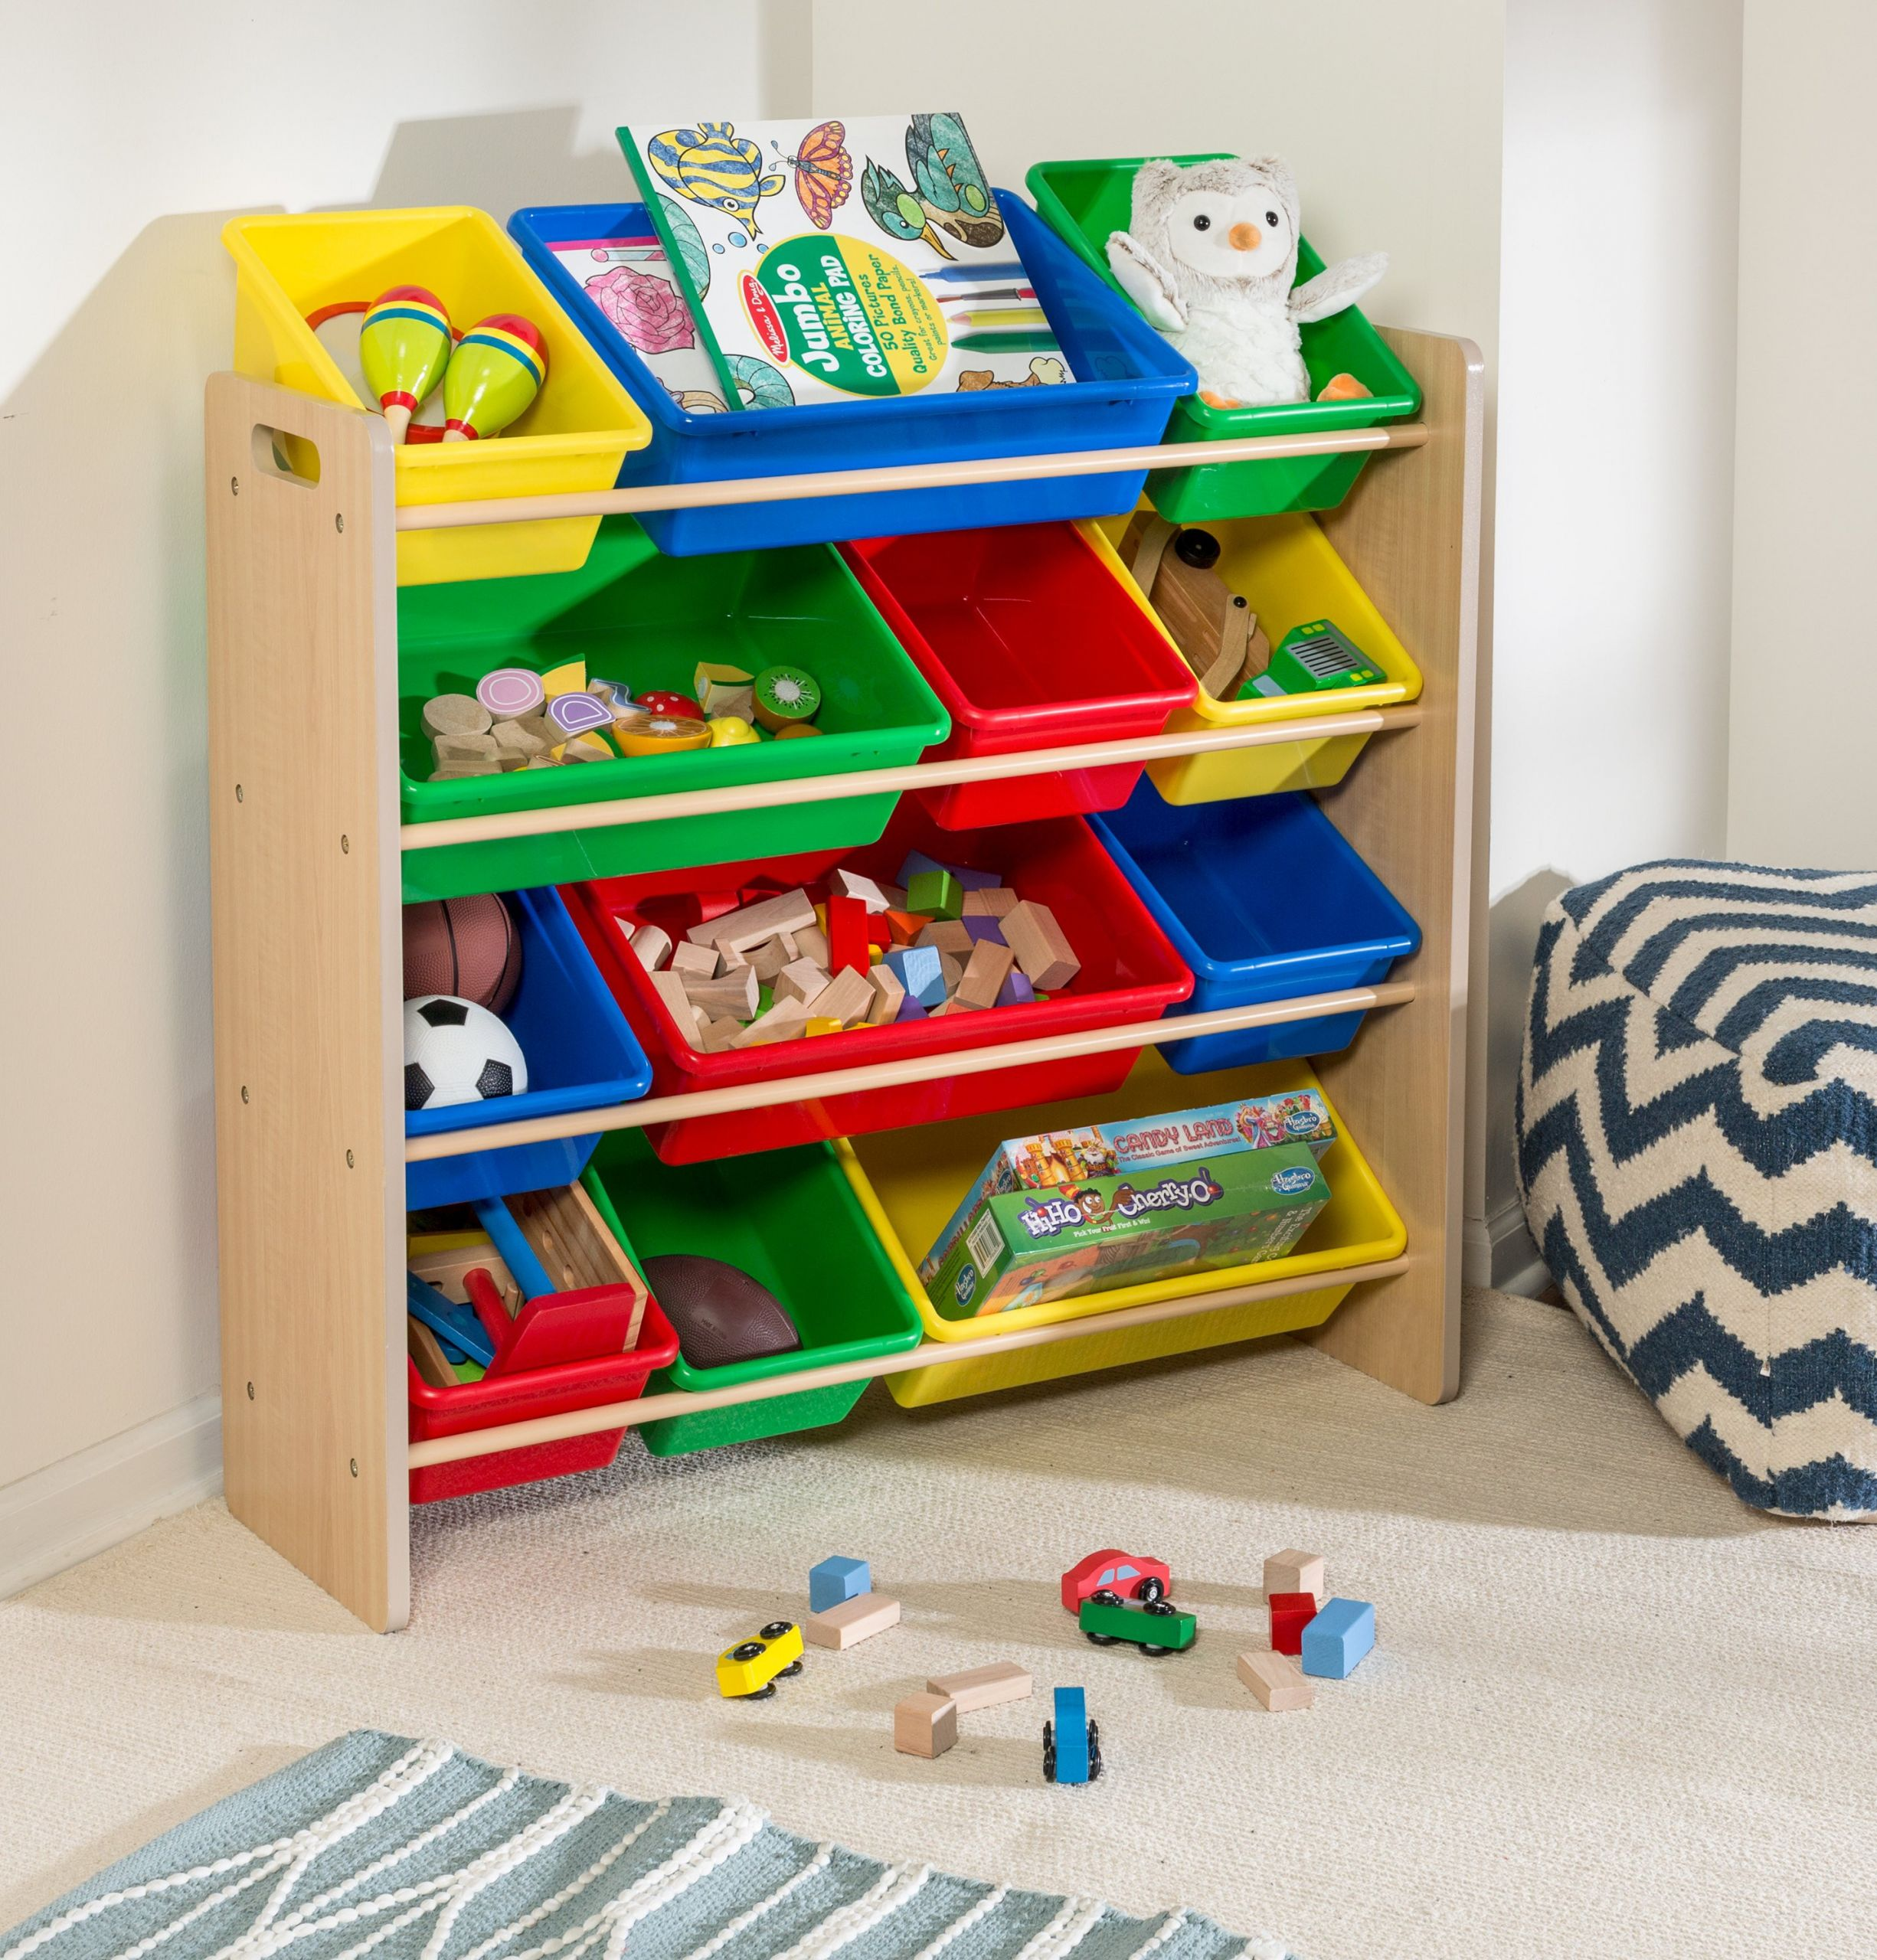 Kids Toys Storage  Kids Toy Storage Organizer with Plastic Bins Natural